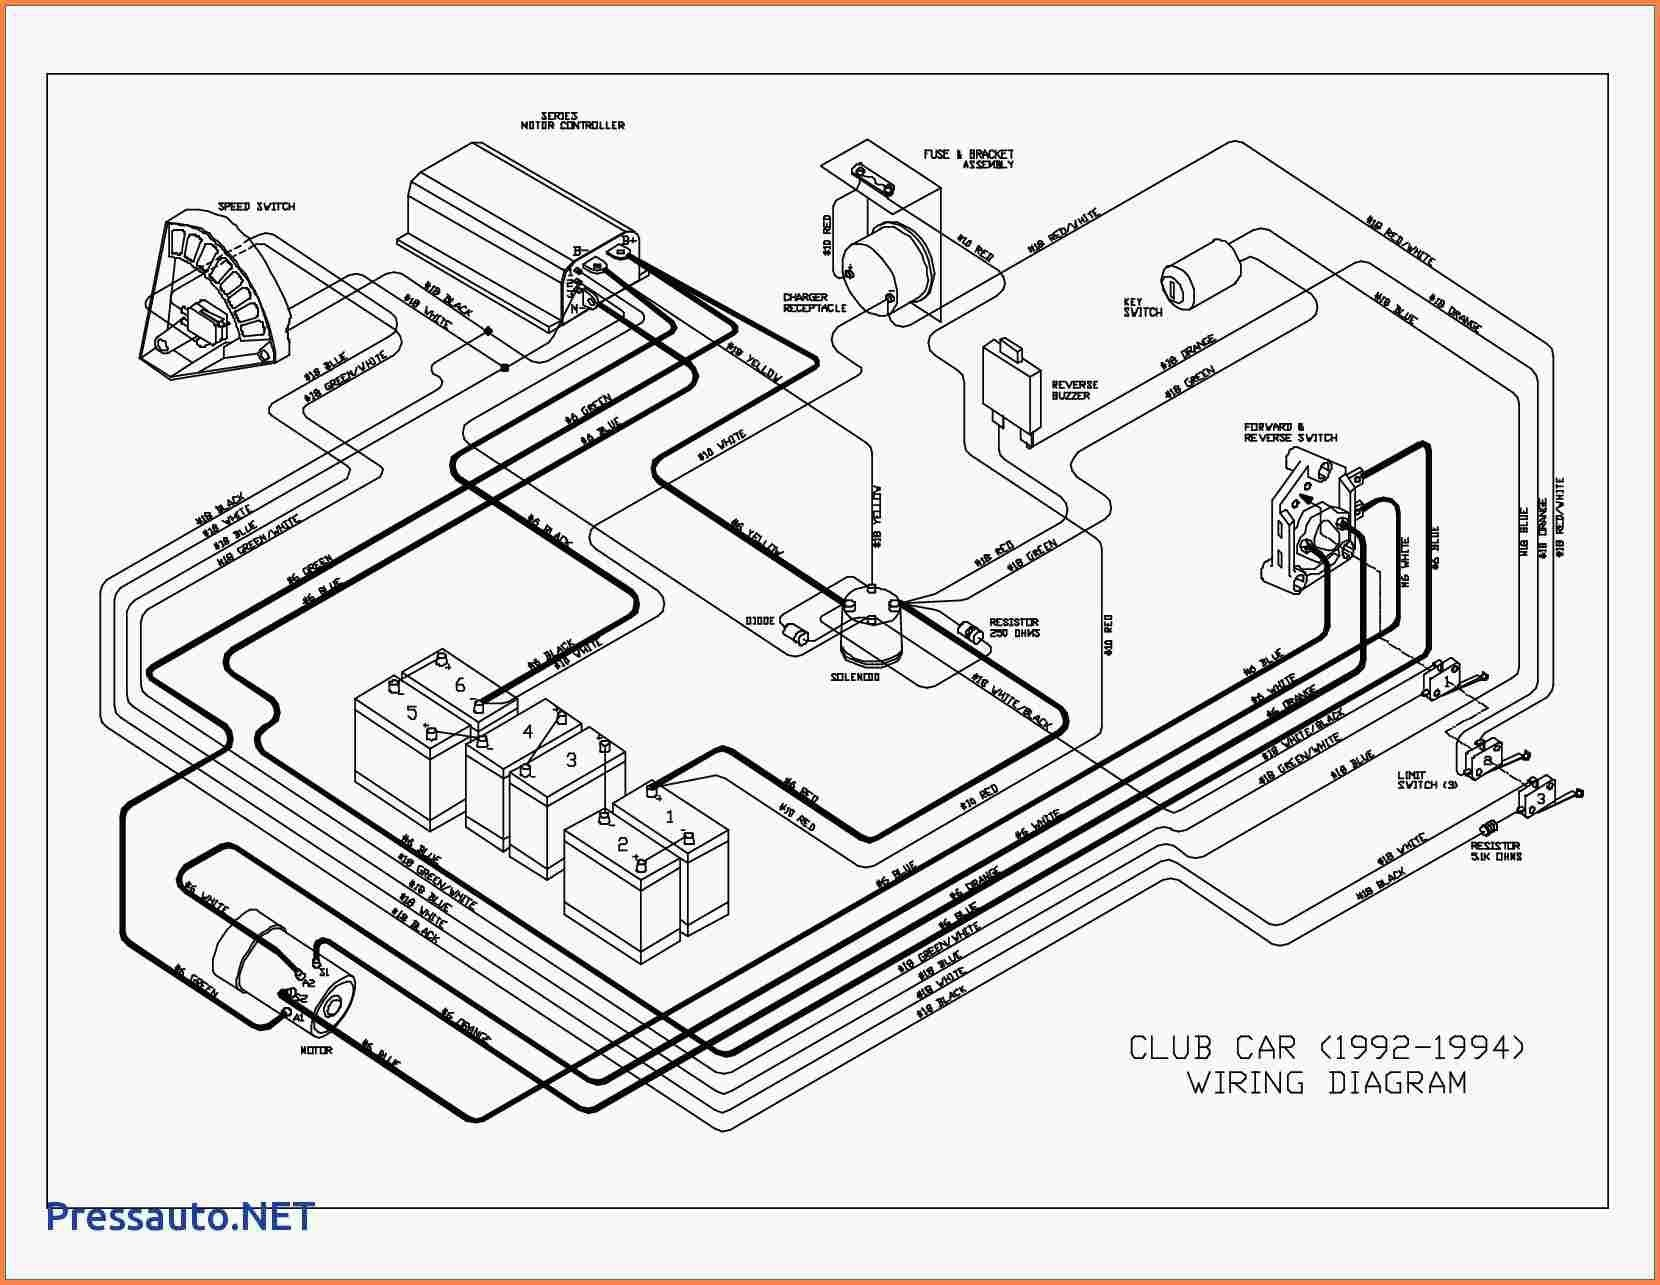 36 Volt Club Cart Wiring Diagram Wiring Diagram Toolbox 1985 Club Car Golf Cart Wiring Diagram 1985 Club Car Wiring Diagram